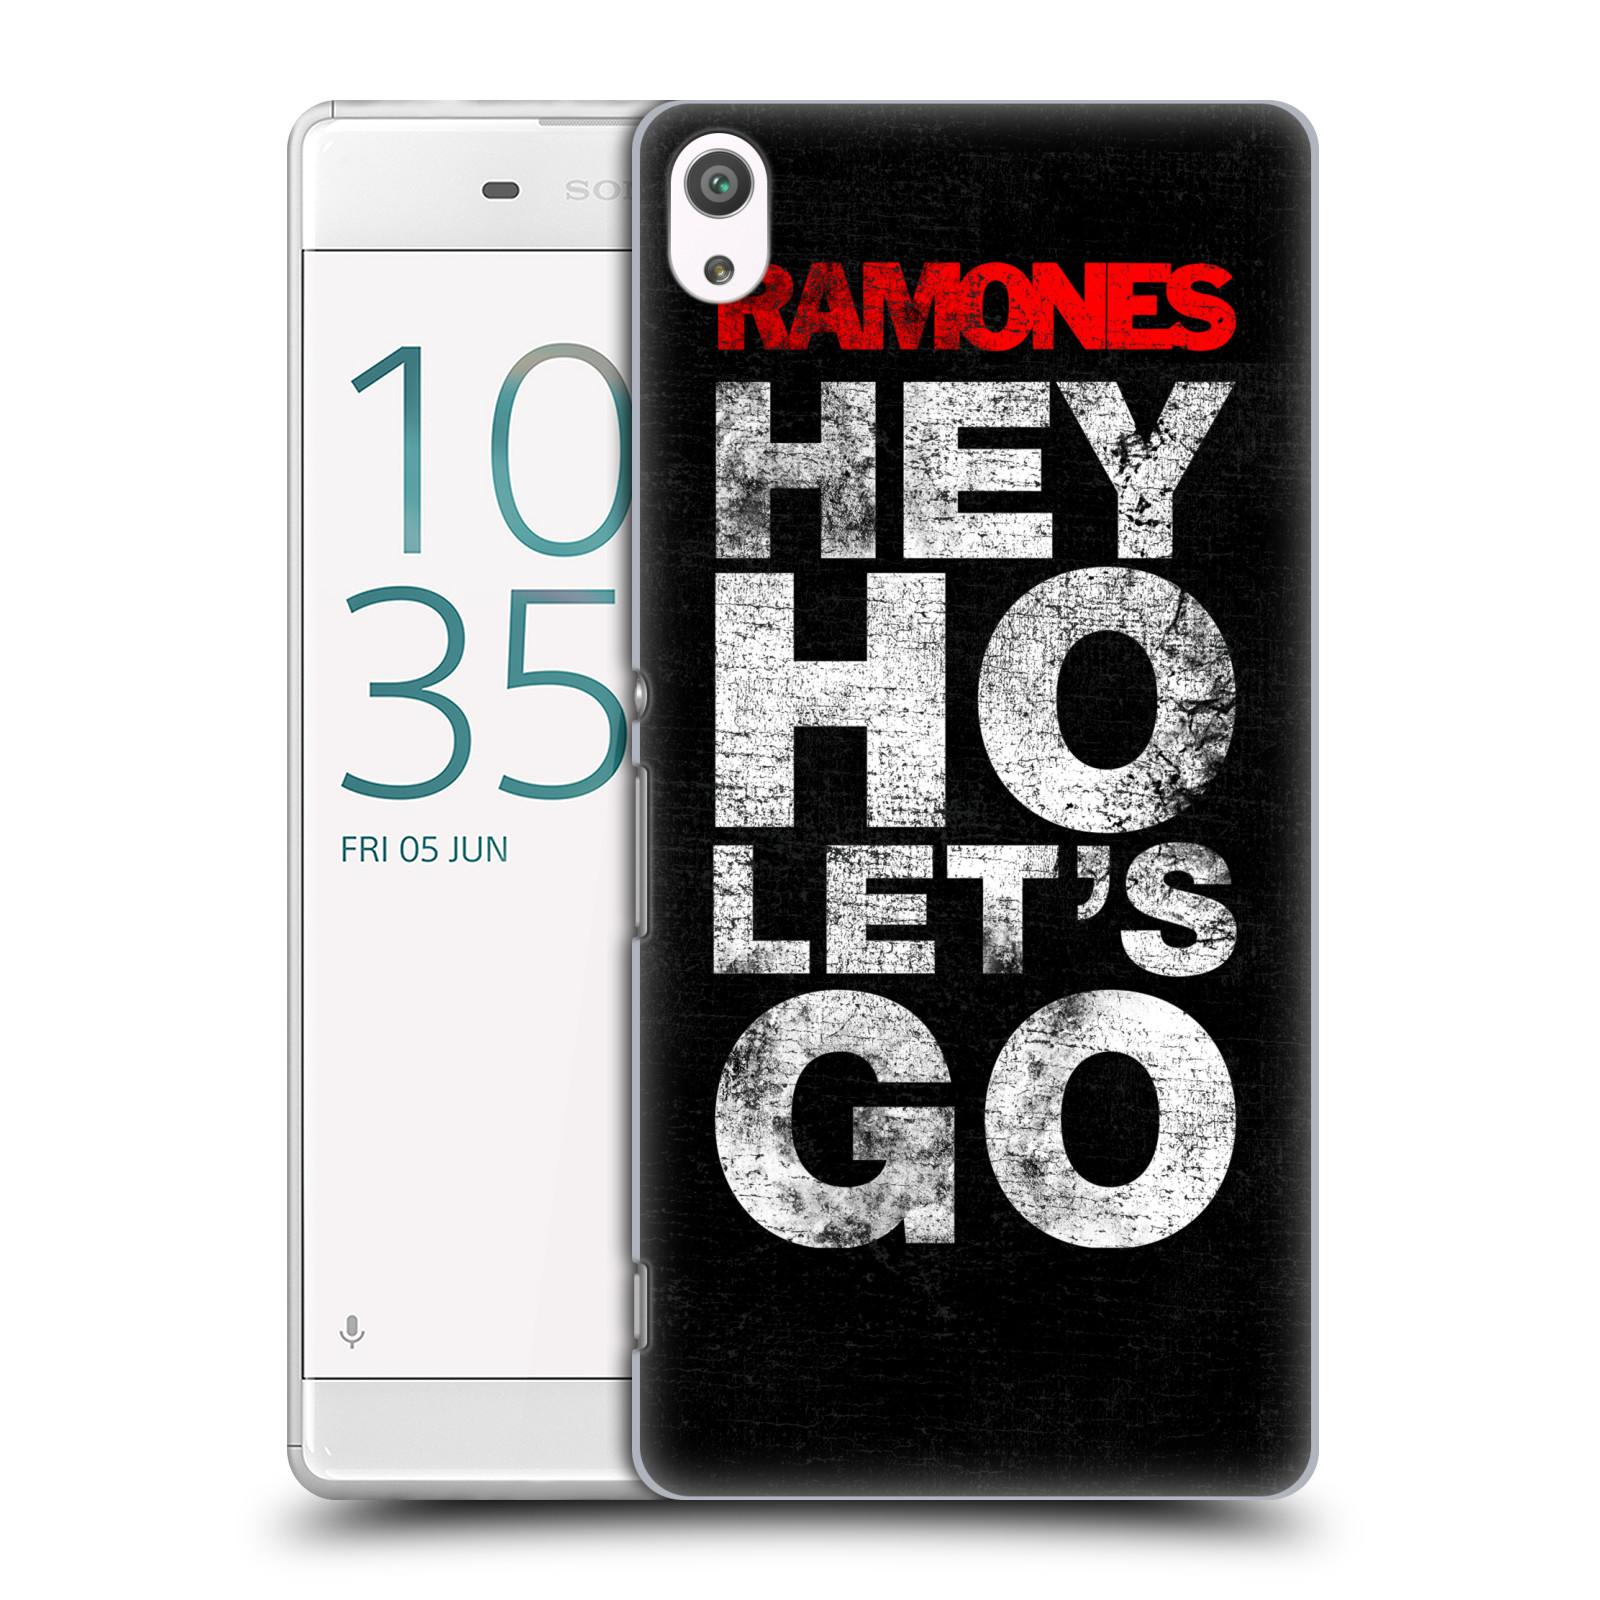 Plastové pouzdro na mobil Sony Xperia XA Ultra HEAD CASE The Ramones - HEY HO LET´S GO (Plastový kryt či obal na mobilní telefon s oficiálním licencovaným motivem The Ramones pro Sony Xperia XA Ultra F3211)